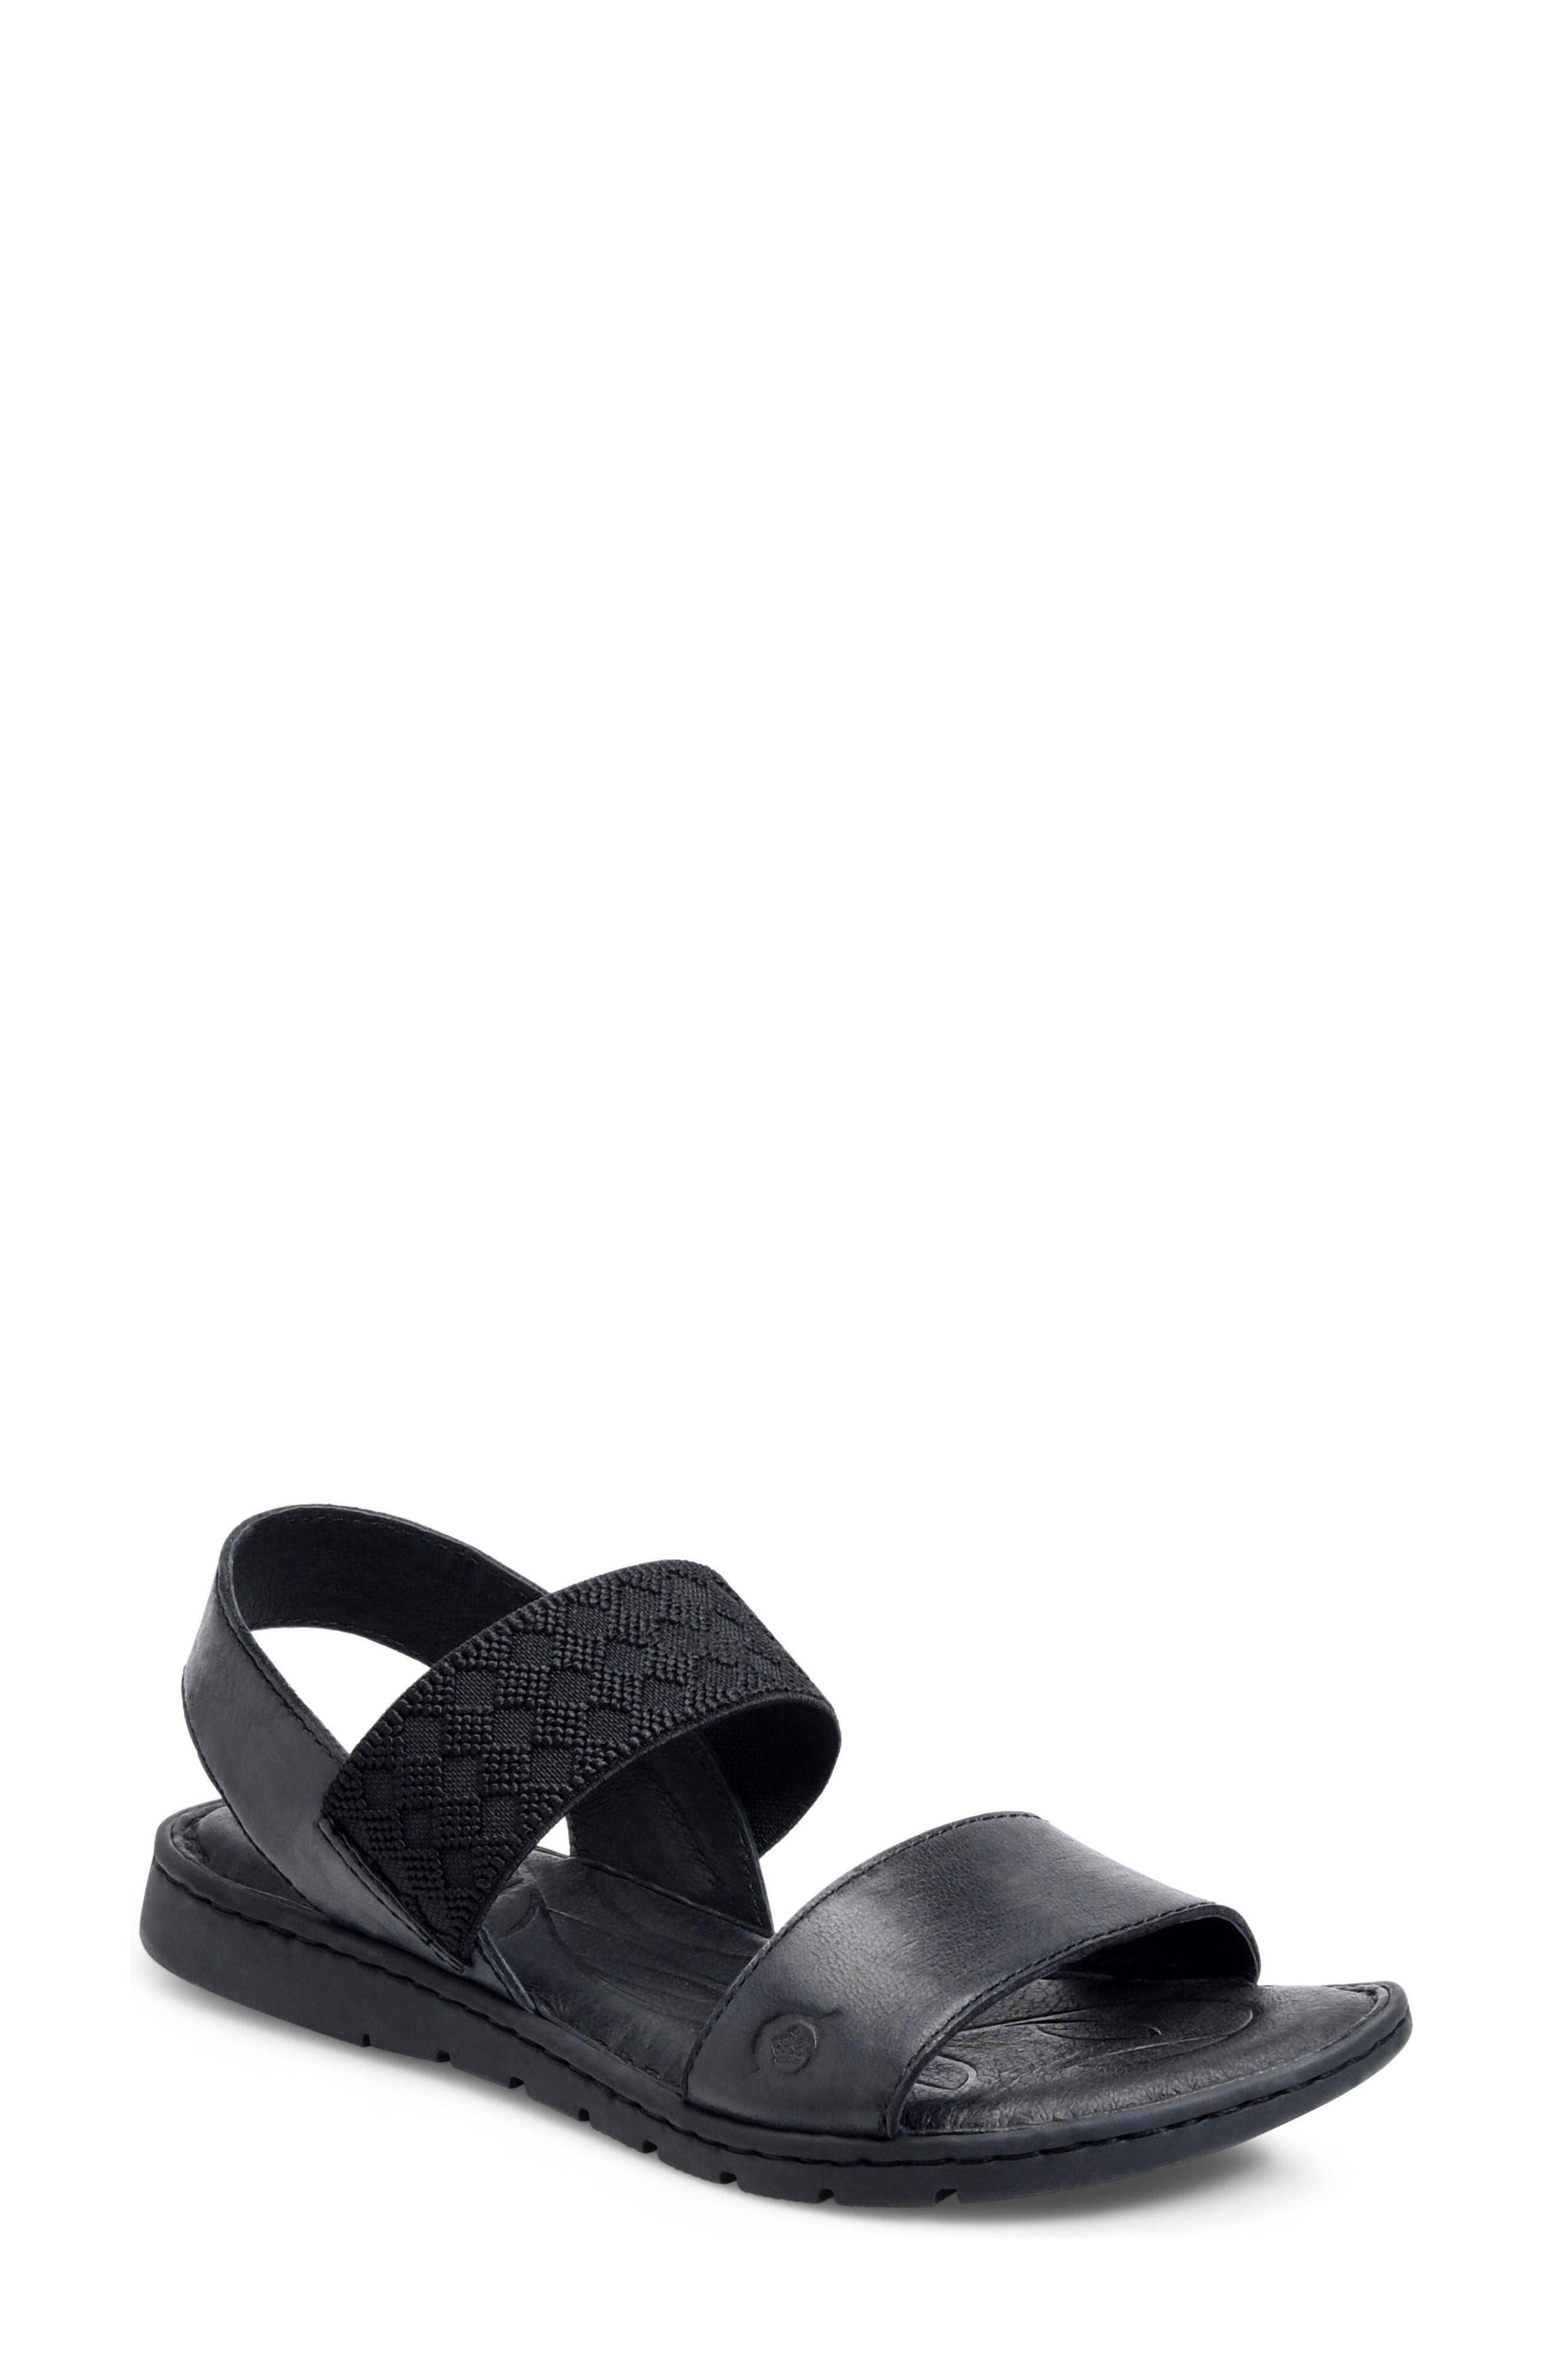 Parsons Sandal,                             Main thumbnail 1, color,                             Black Full Grain Leather